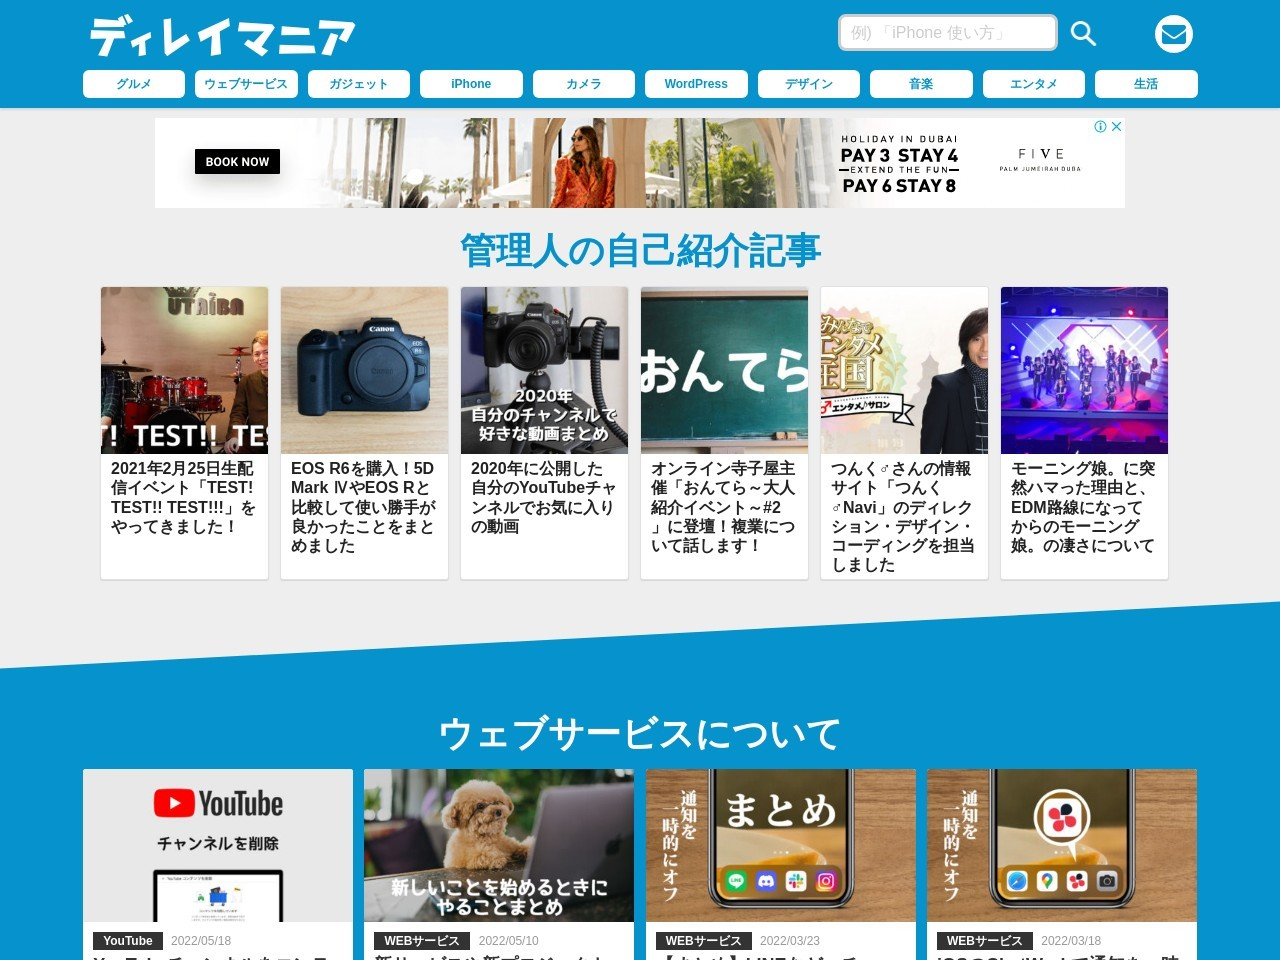 http://delaymania.com/201212/blog/appdownloadbutton_apphtml/